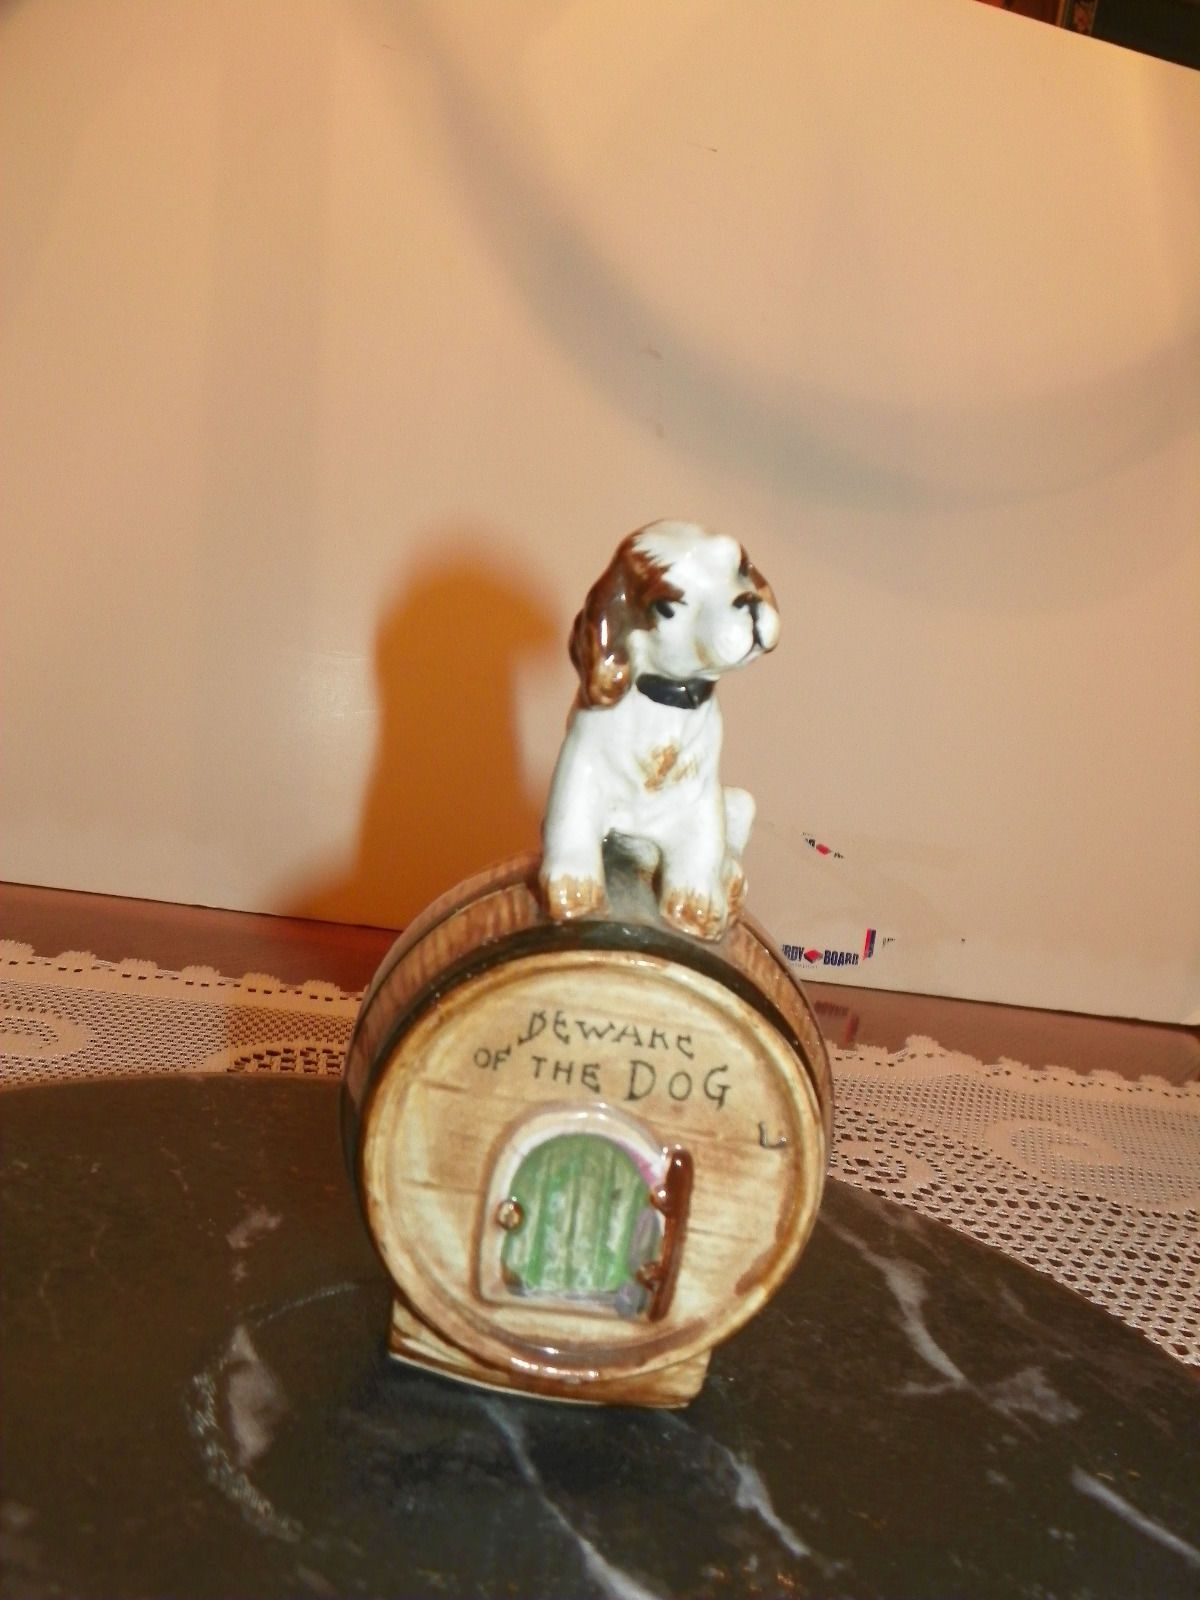 Vtg Beware Of The Dog Porcelain Bank Guarding Whiskey Barrel No Chips Cracks With Images Whiskey Barrel Beware Of Dog Dogs